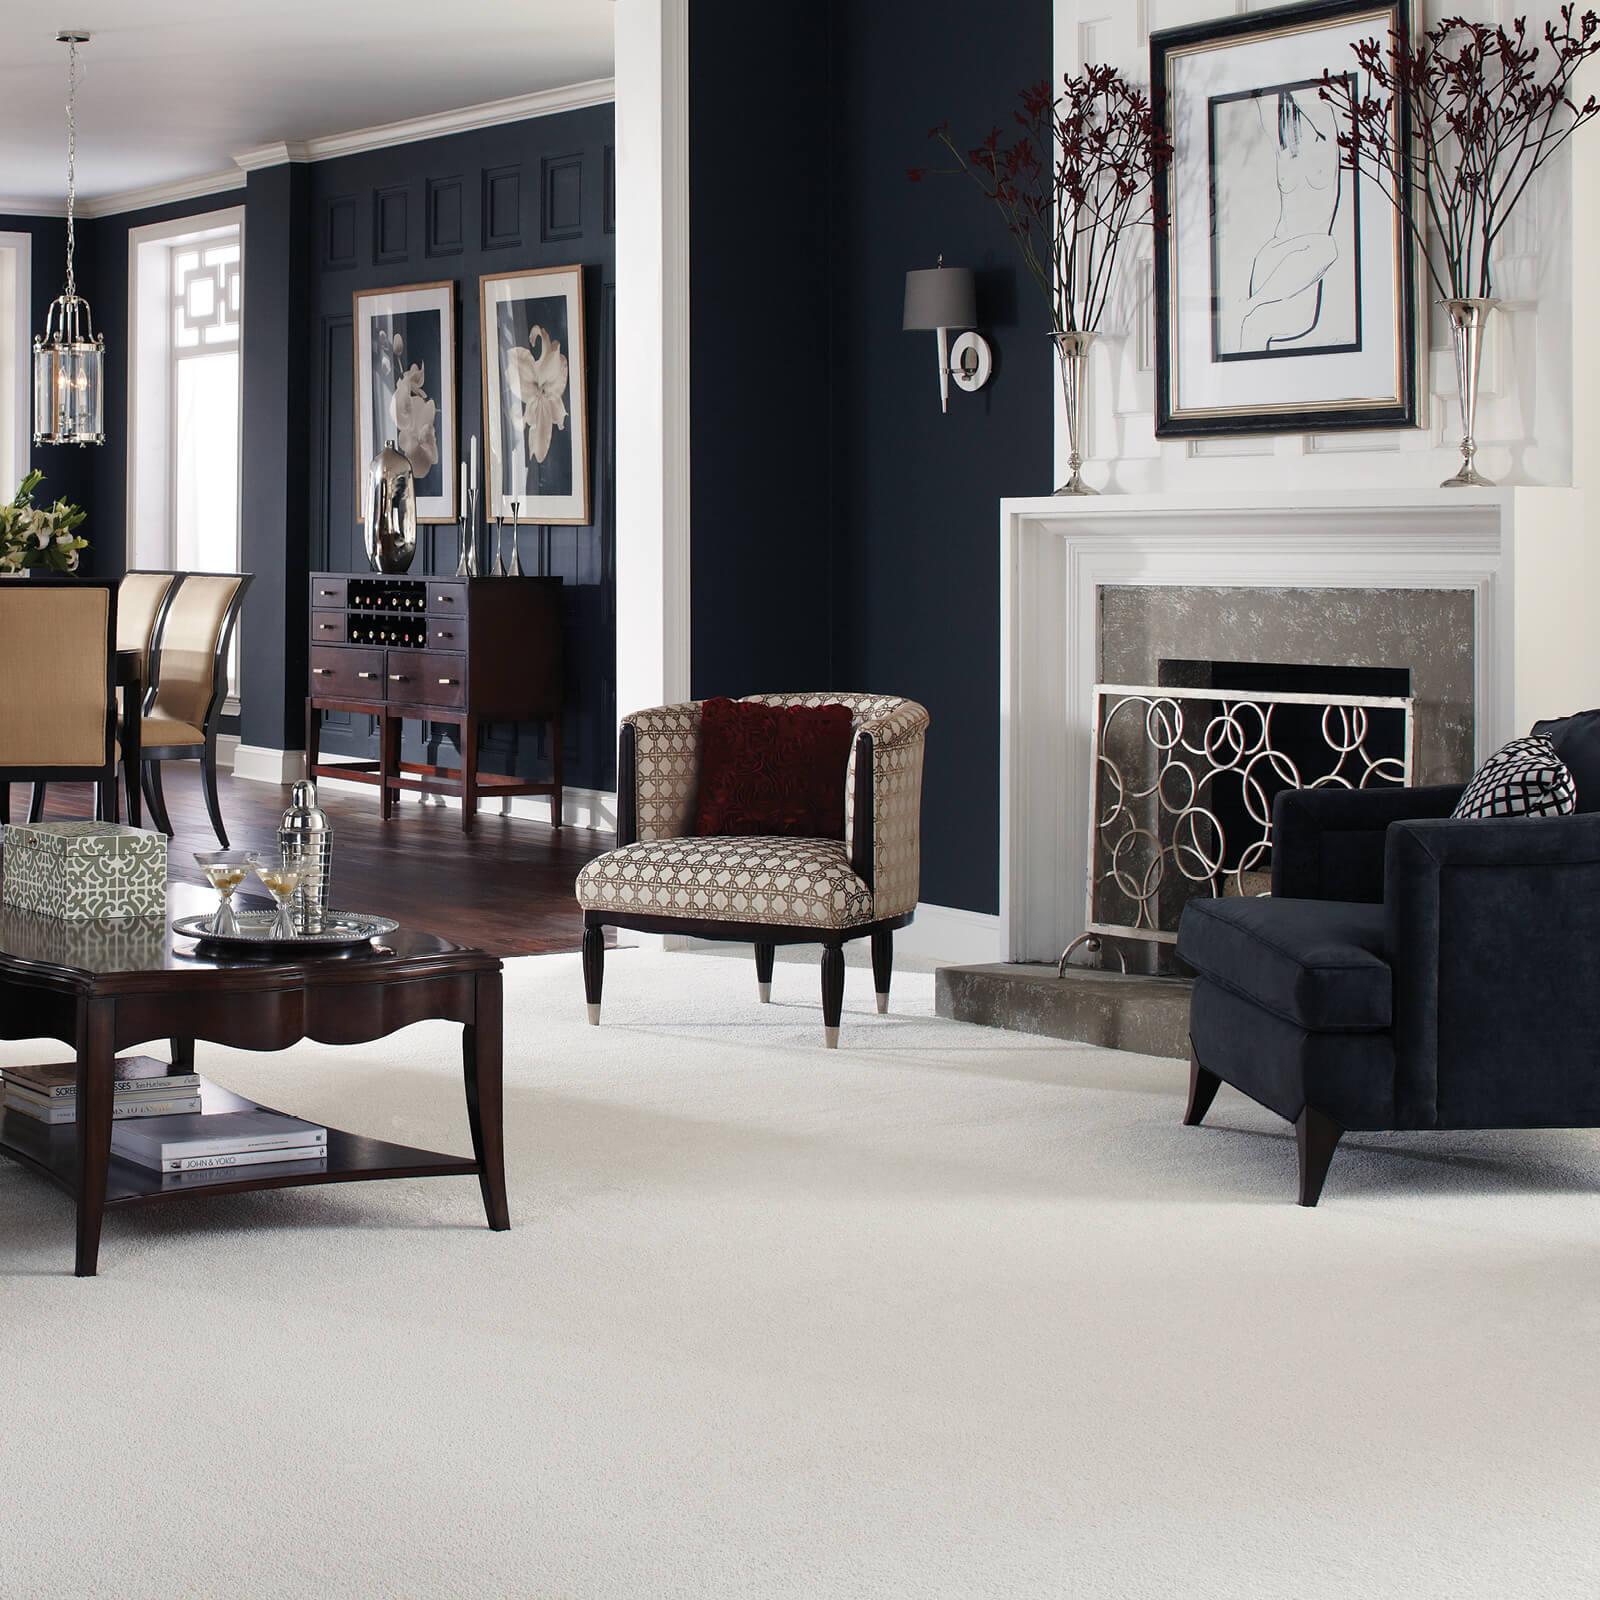 White carpet | Dolphin Carpet & Tile